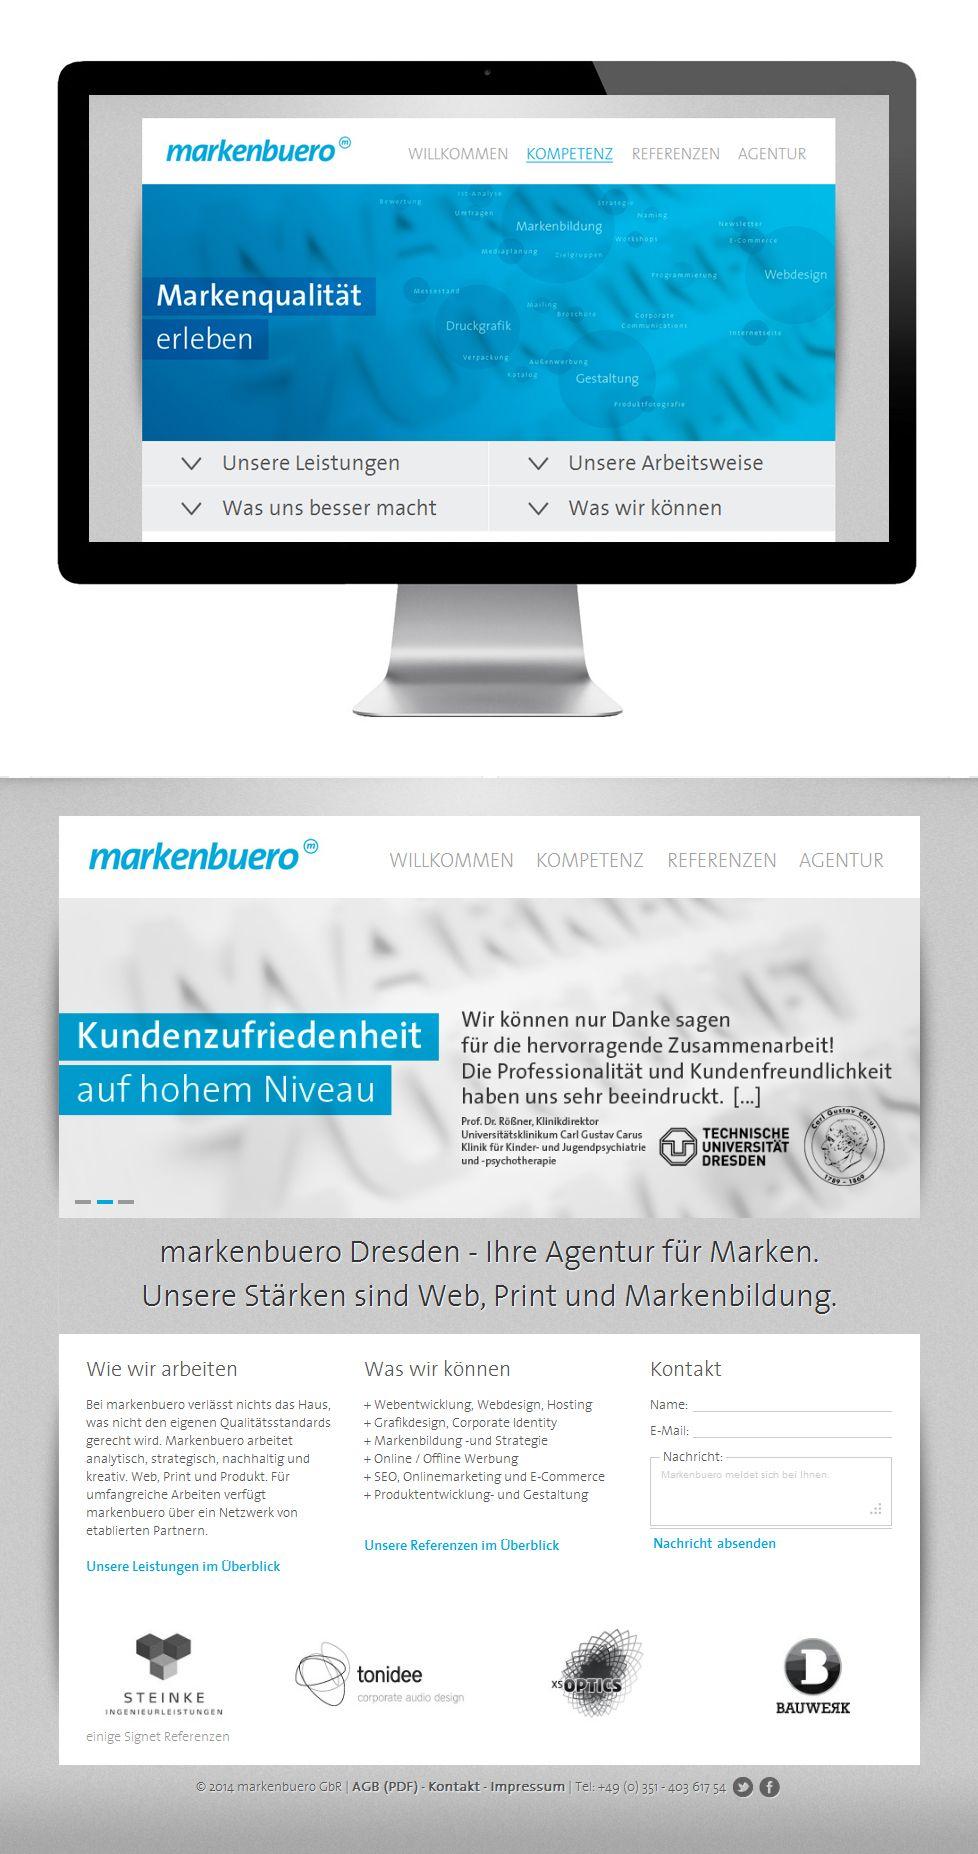 Innenfarben für haus gui graphic web design and marketing collaterals for corporate